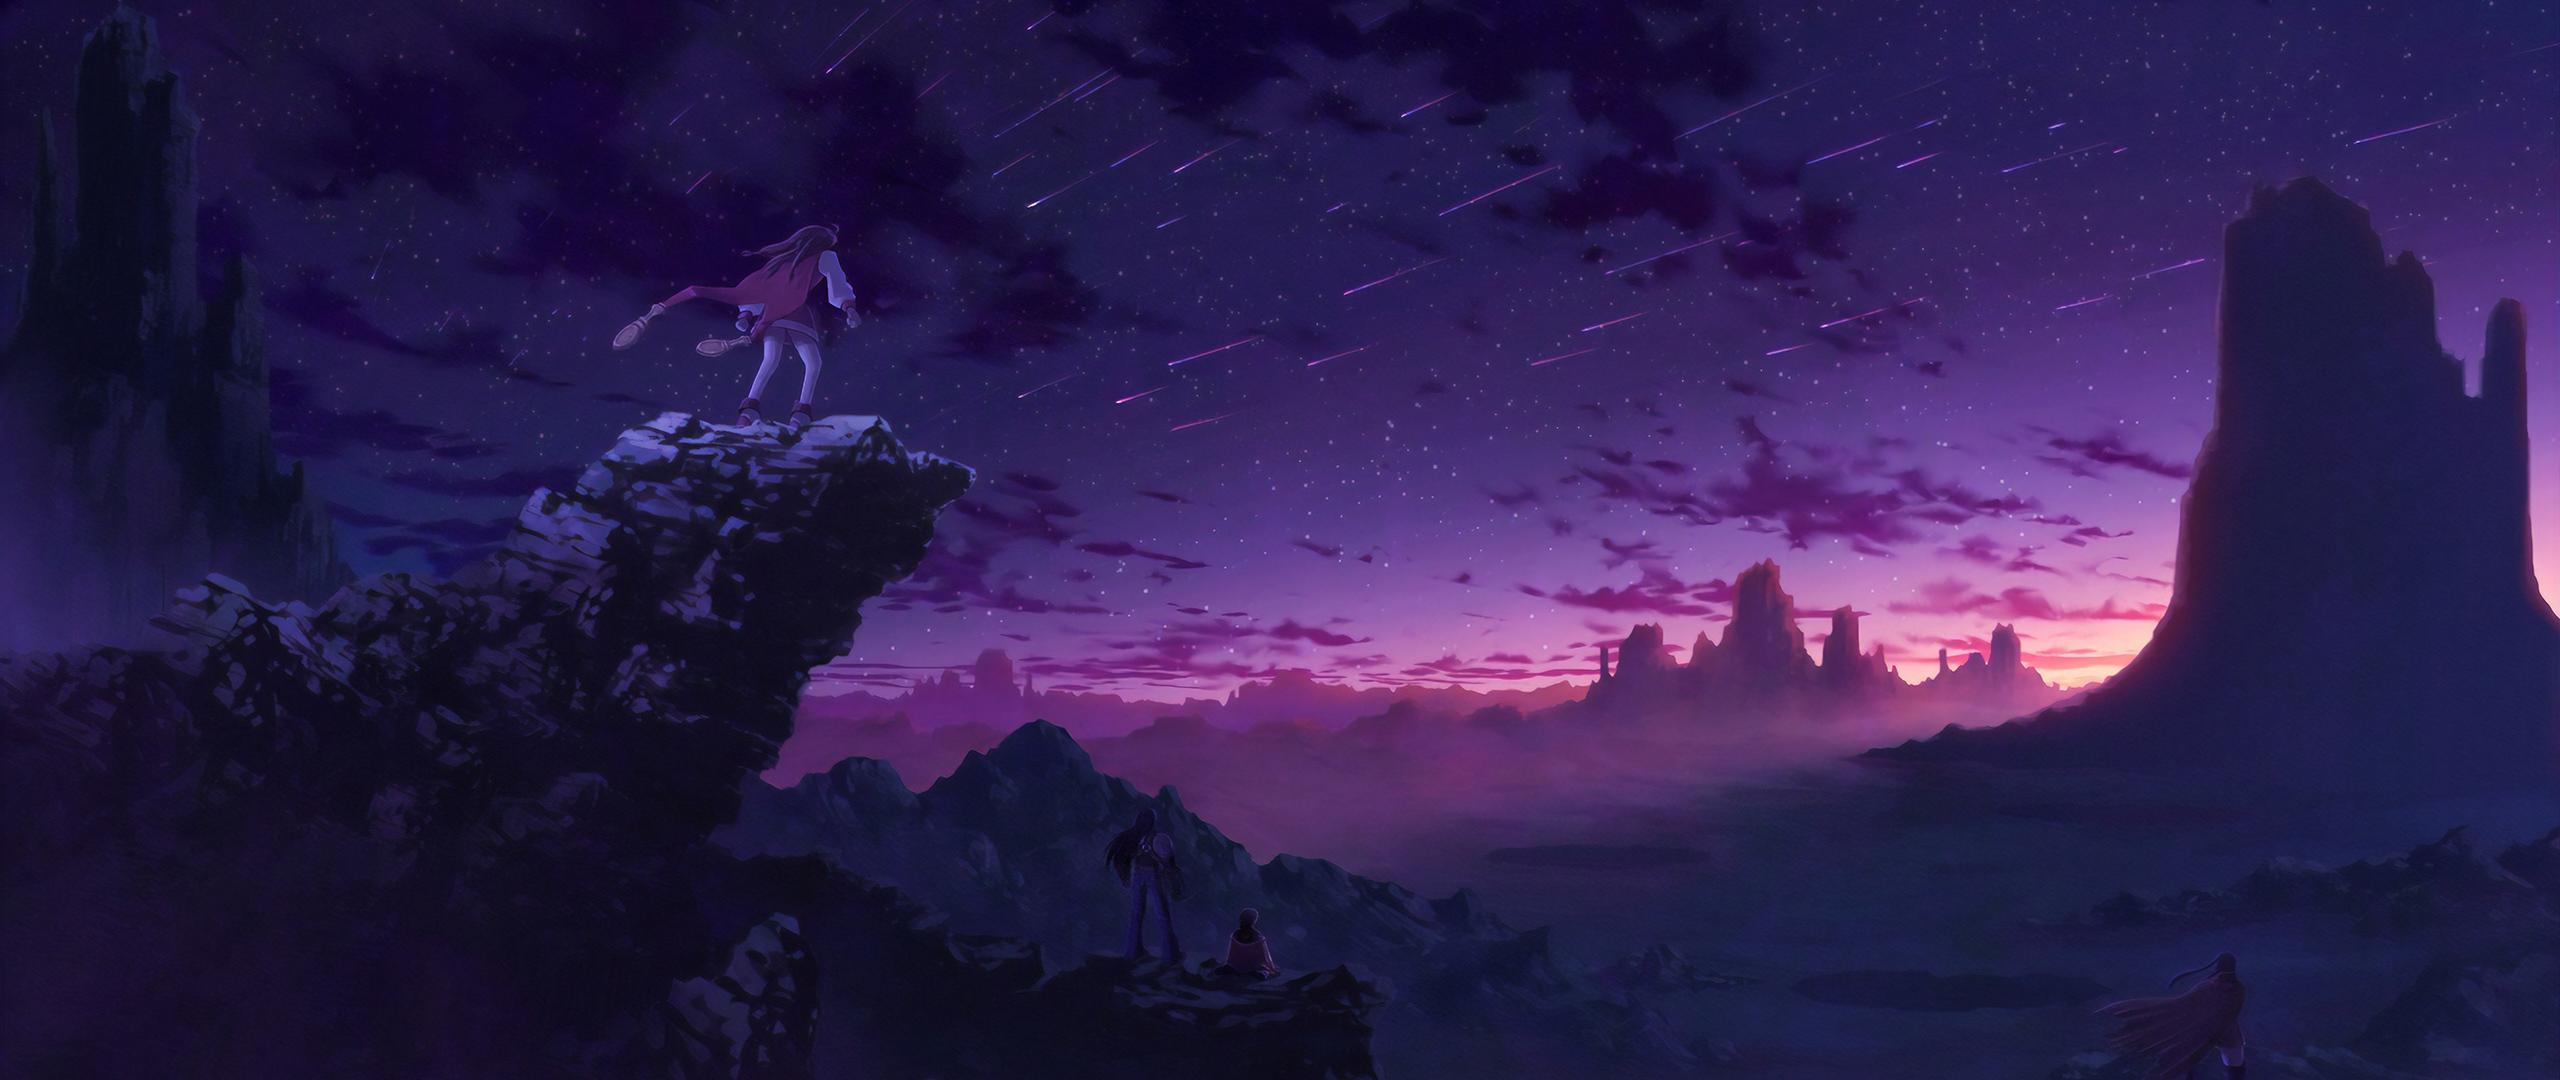 Purple Anime Sky 2560x1080 Download Hd Wallpaper Wallpapertip